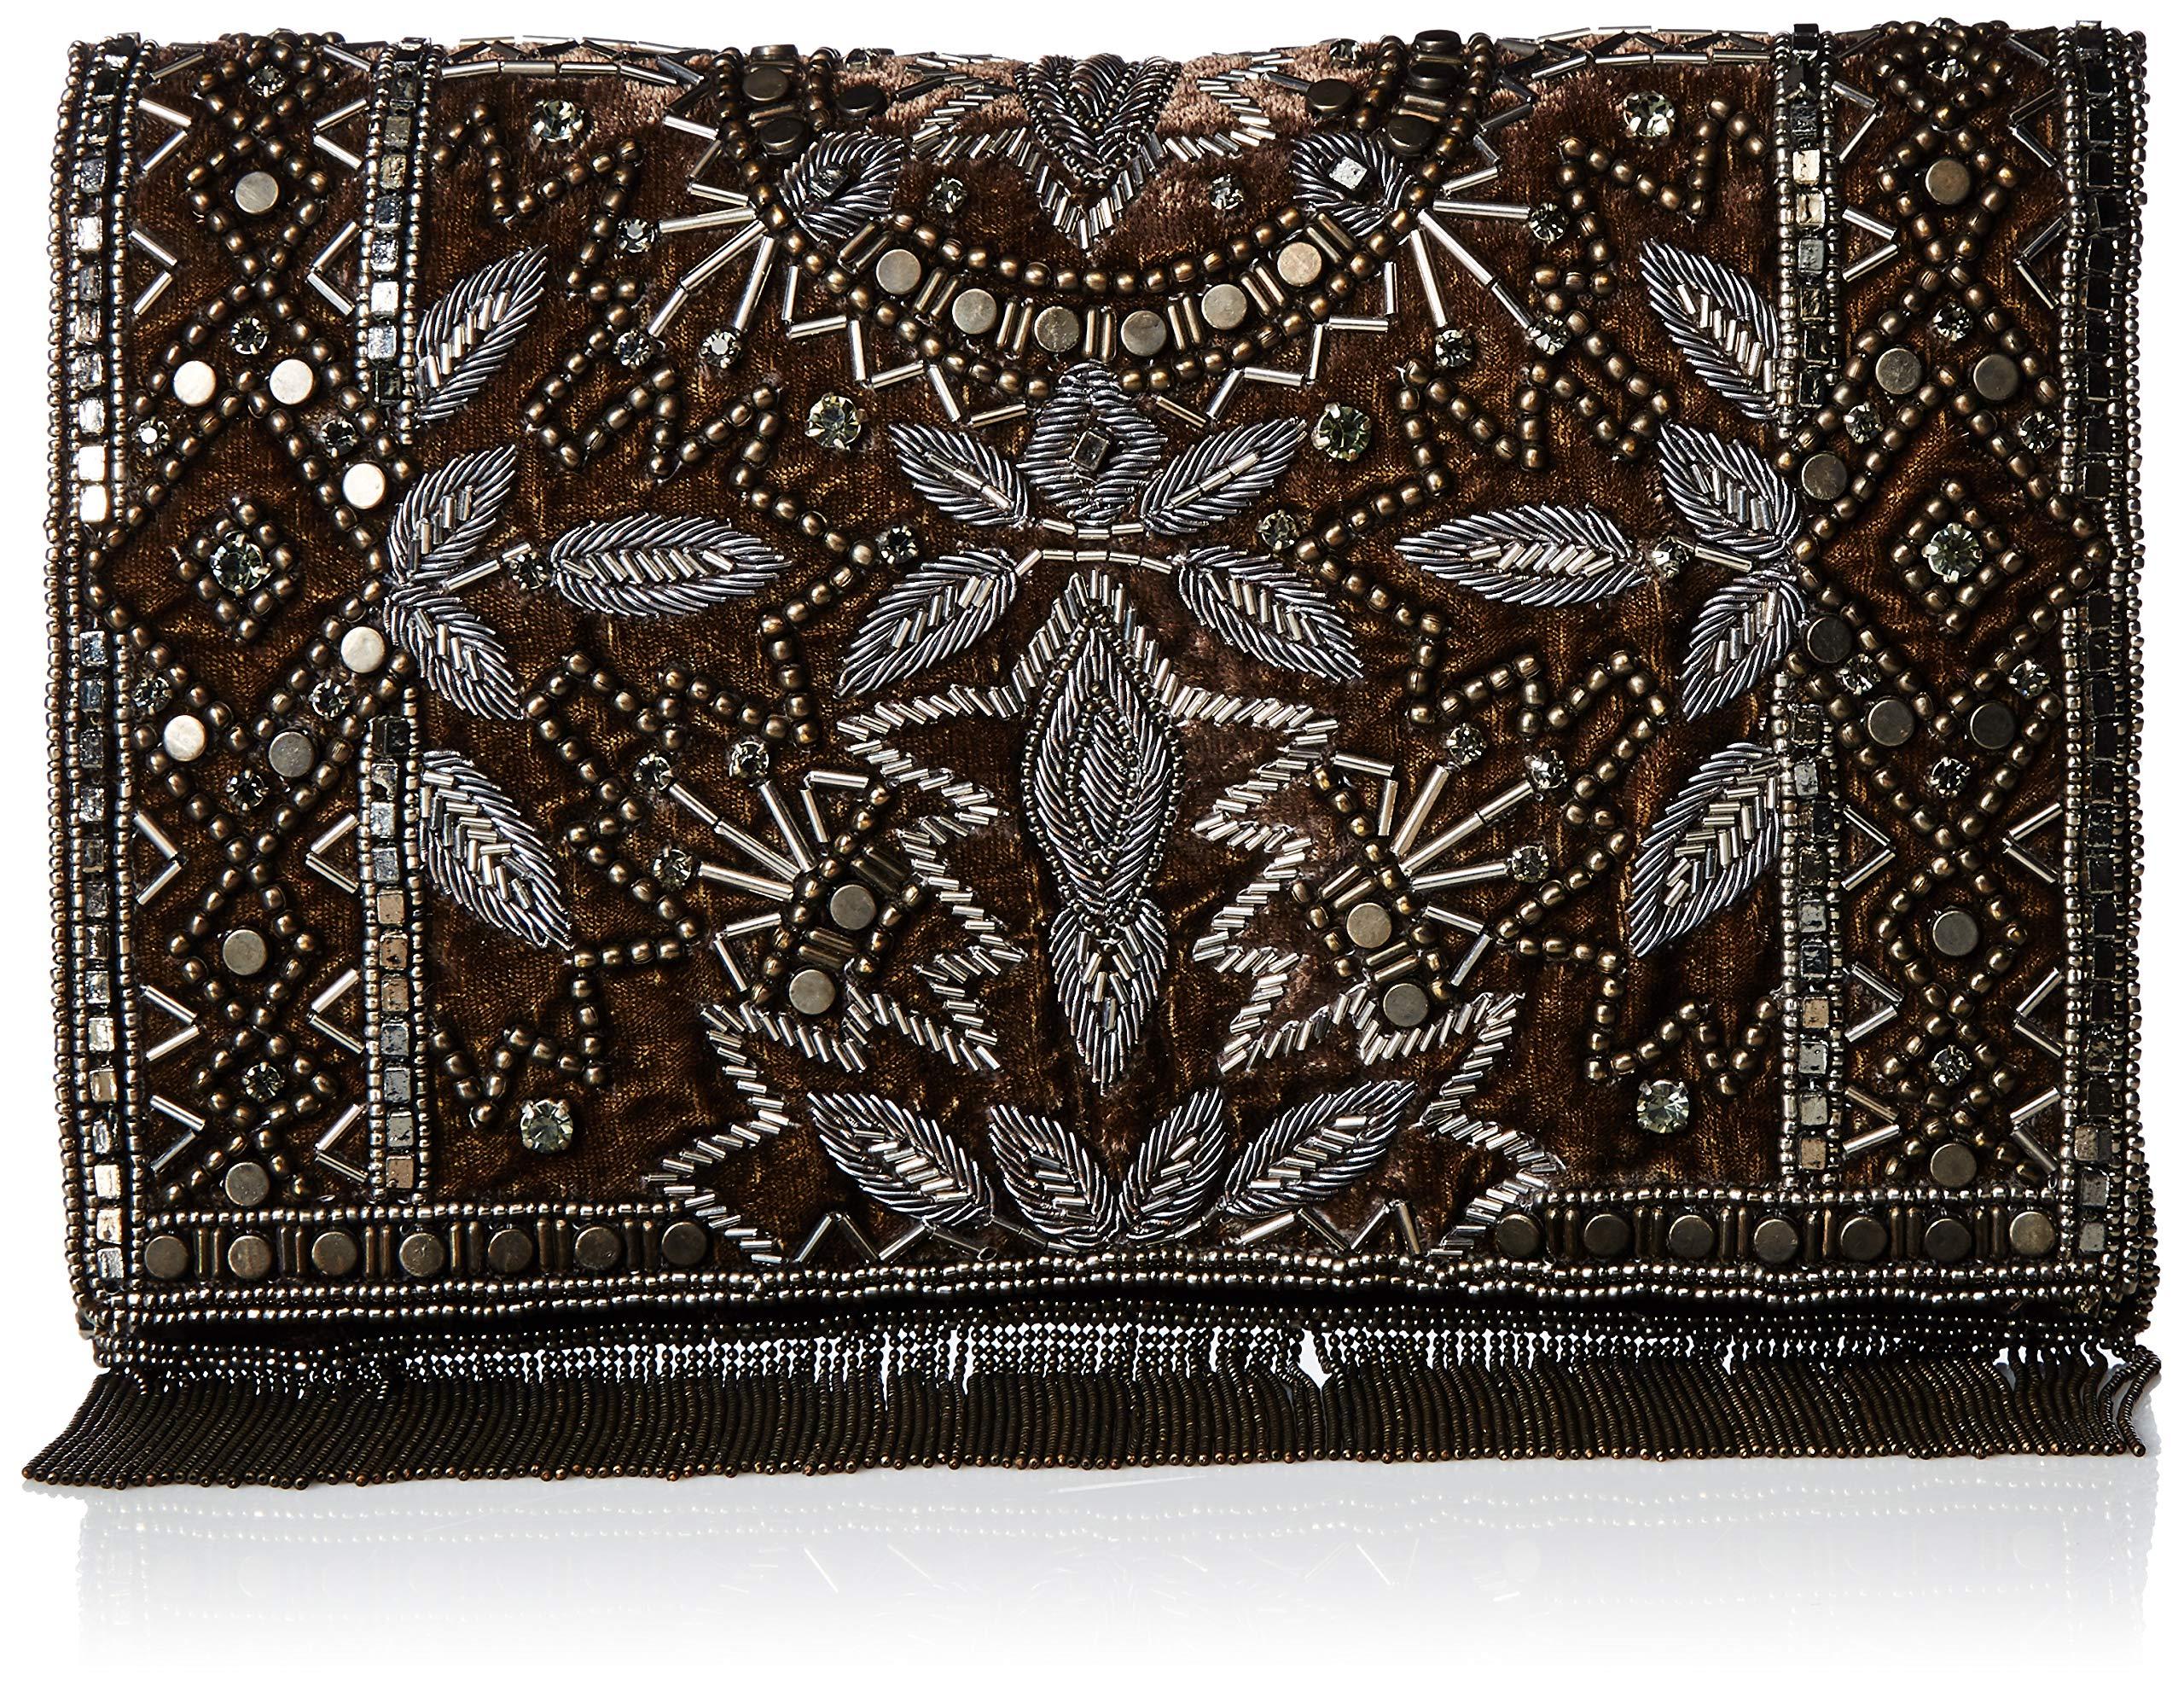 Mary Frances Roaring 20s Antique Pewter Embellished Velvet Crossbody Clutch Handbag, Multi